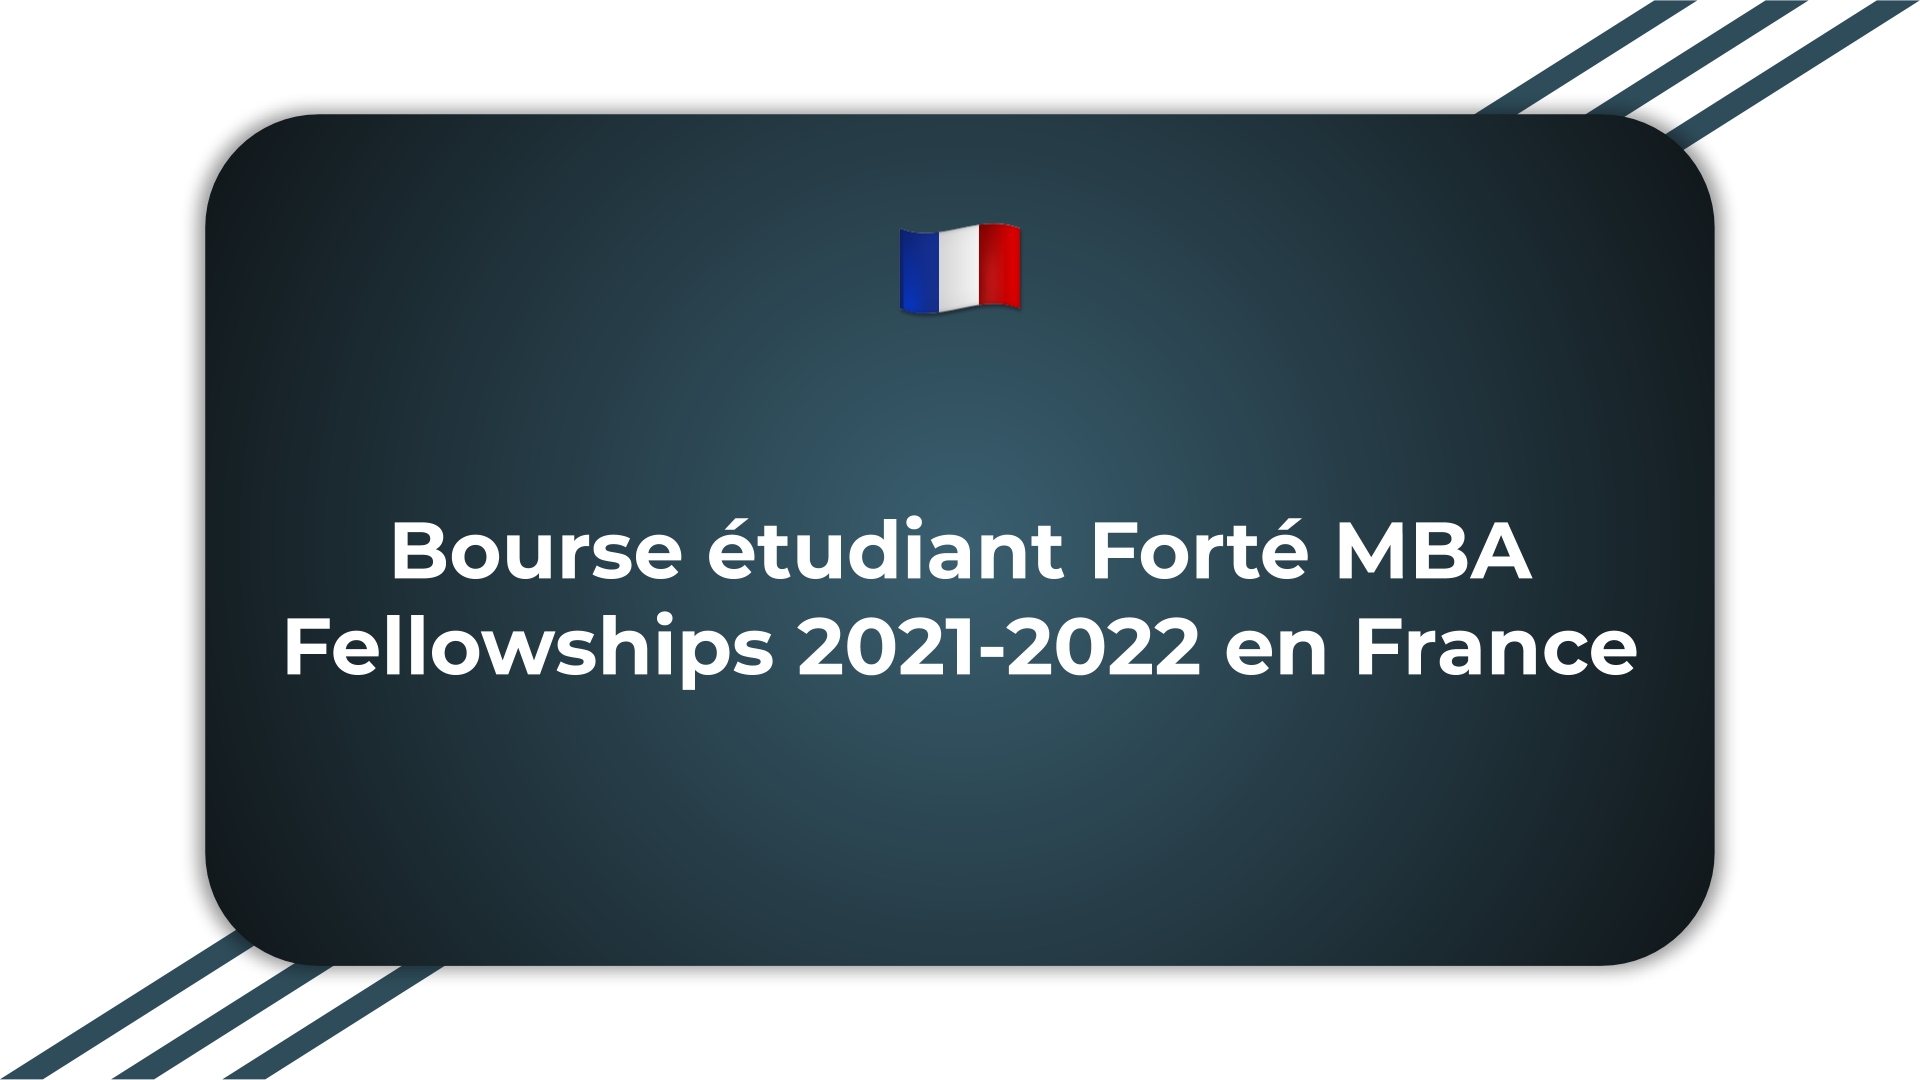 Bourse étudiant Forté MBA Fellowships